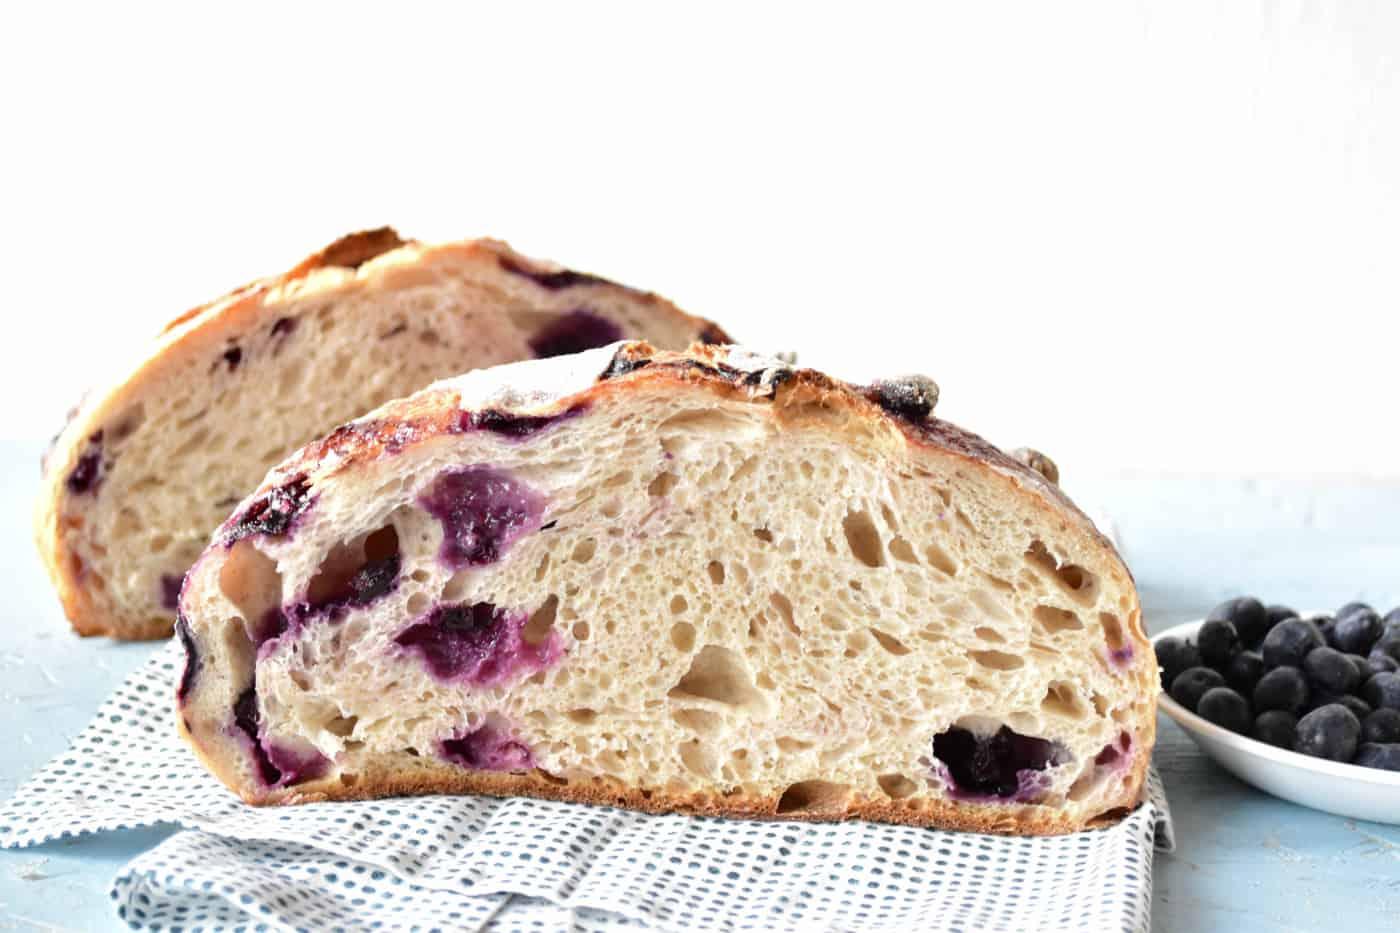 "<img src=""https://cdn.shortpixel.ai/client/q_glossy,ret_img,w_1400,h_933/Sourdough bread.jpg"" alt=""Blueberry rye sourdough bread 2 "">"